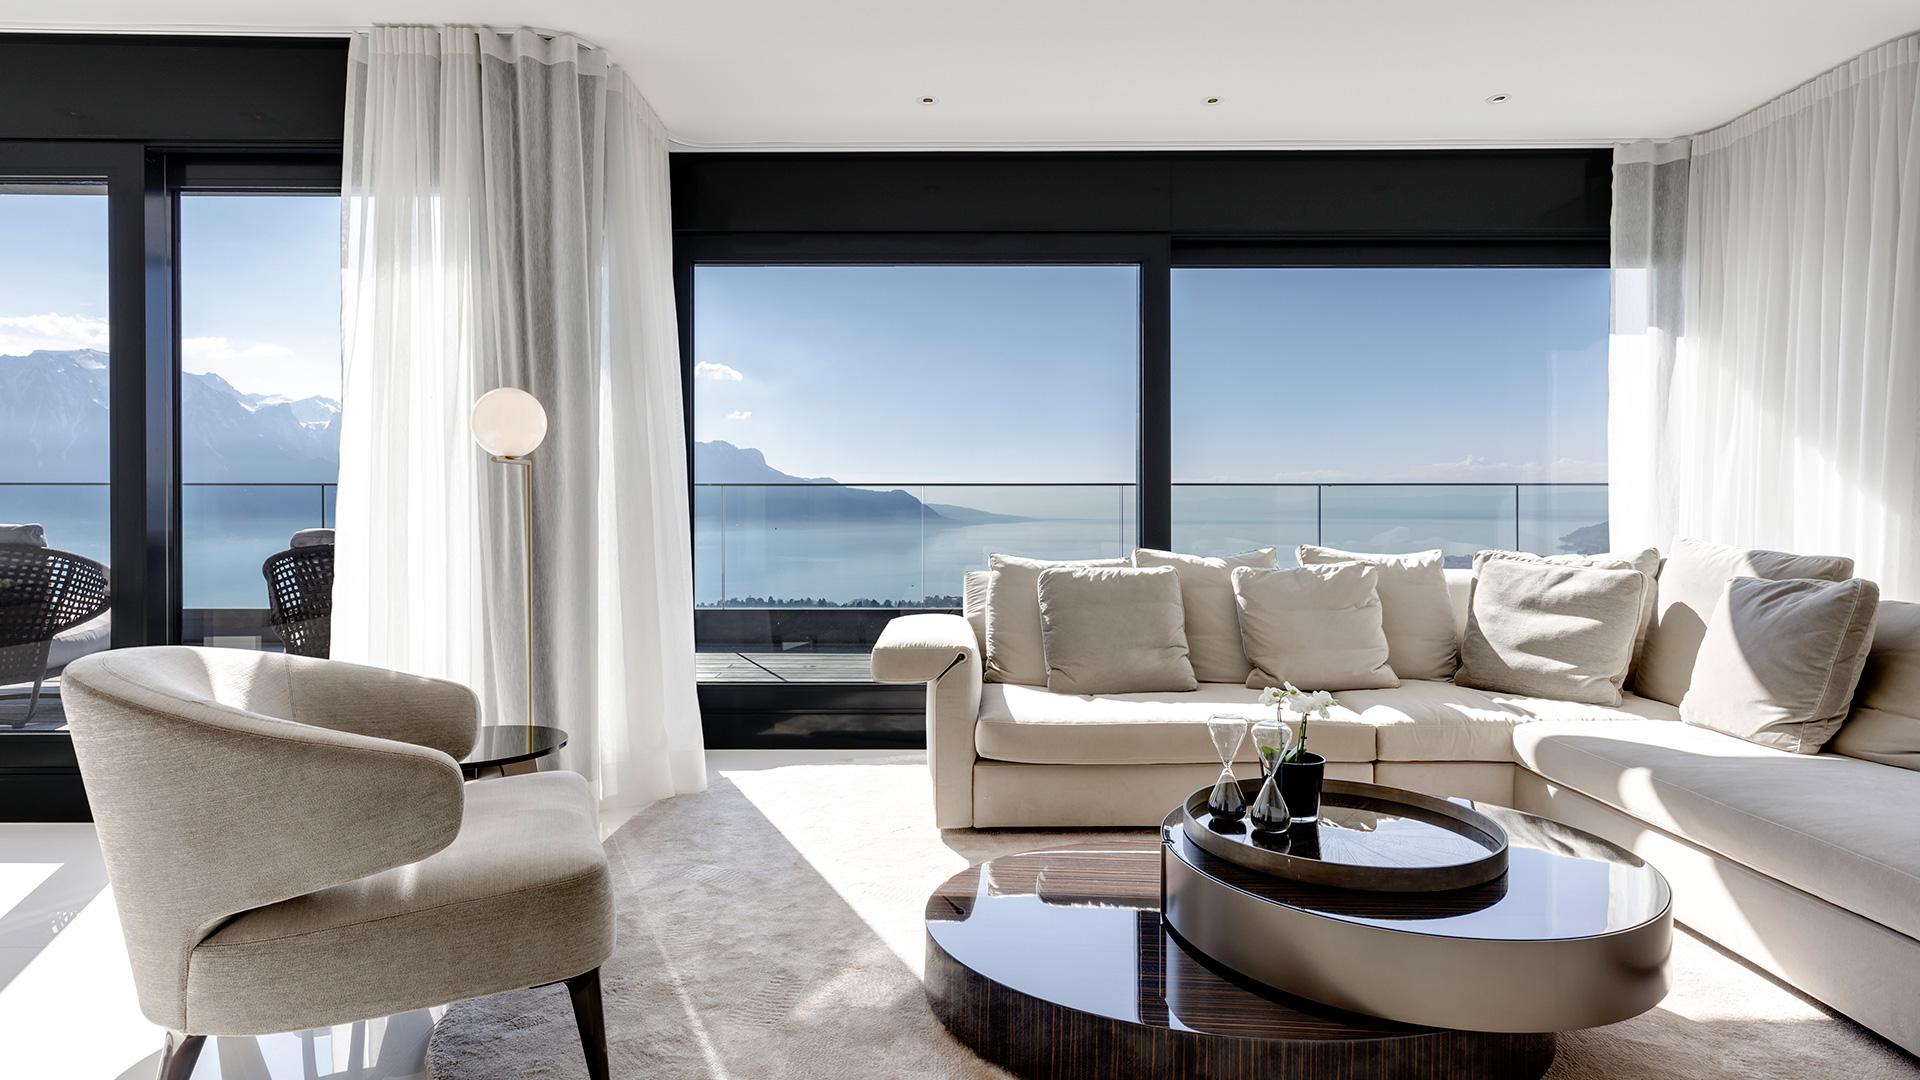 Le Riviera Apartments, Switzerland